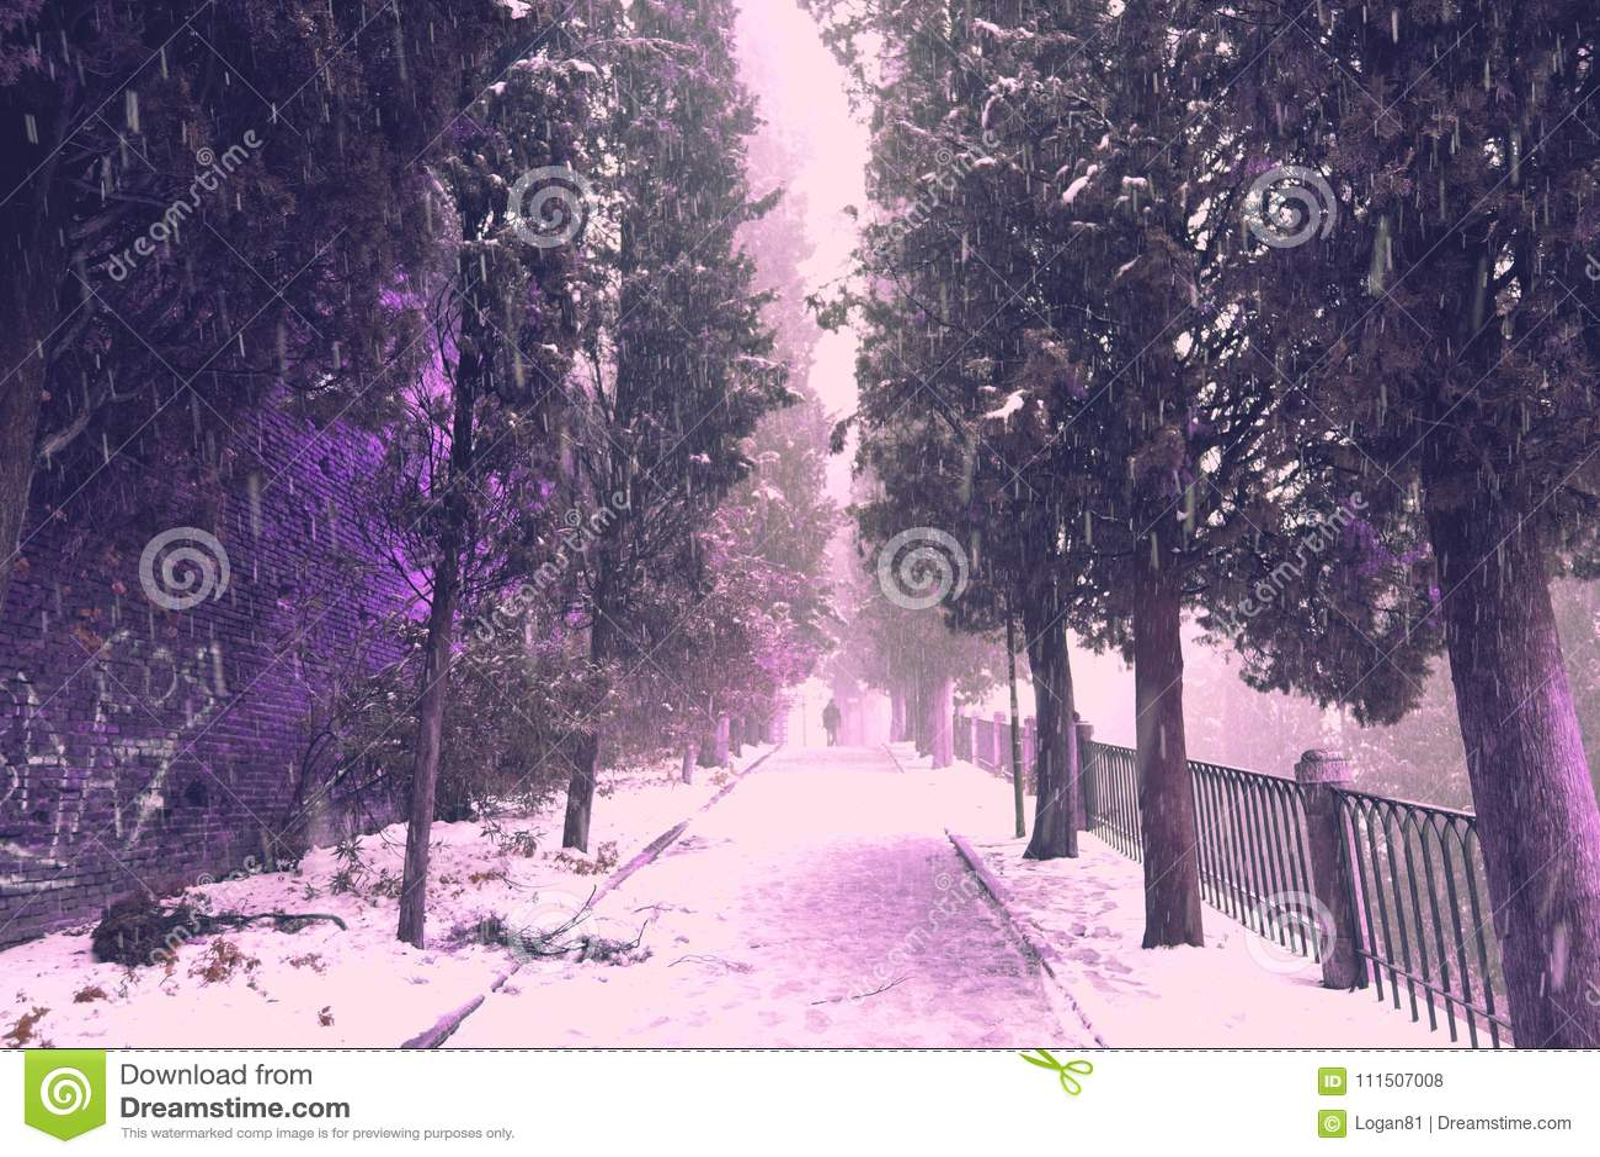 Snowing in Verona town, Italy